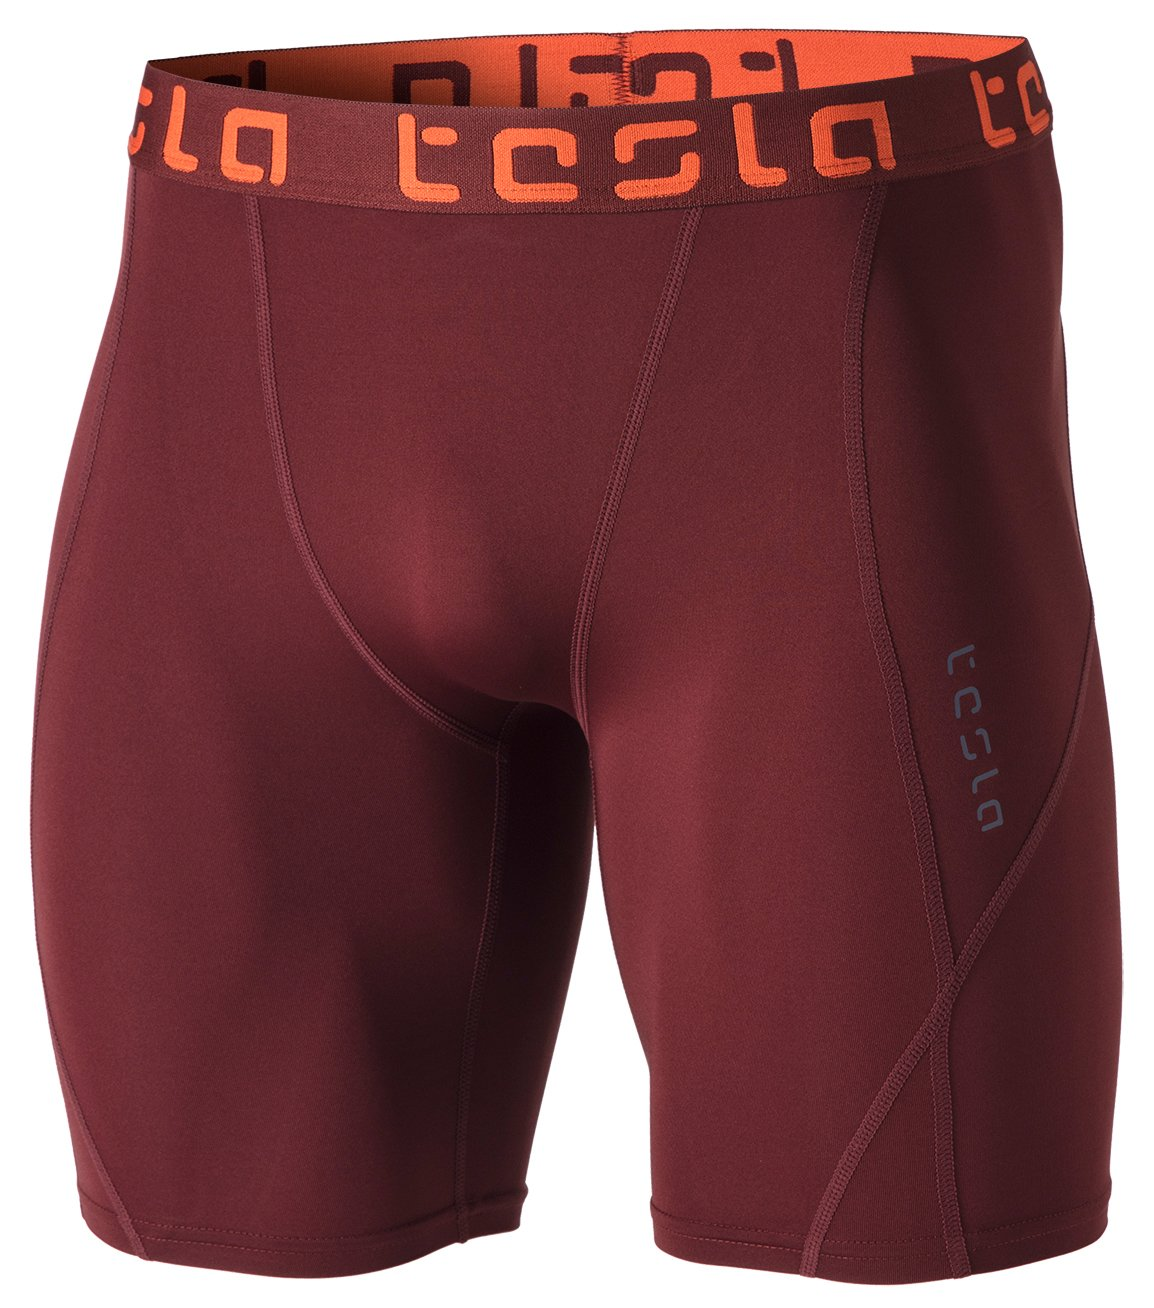 TSLA TM-MUS17-BCK_Small Men's Compression Shorts